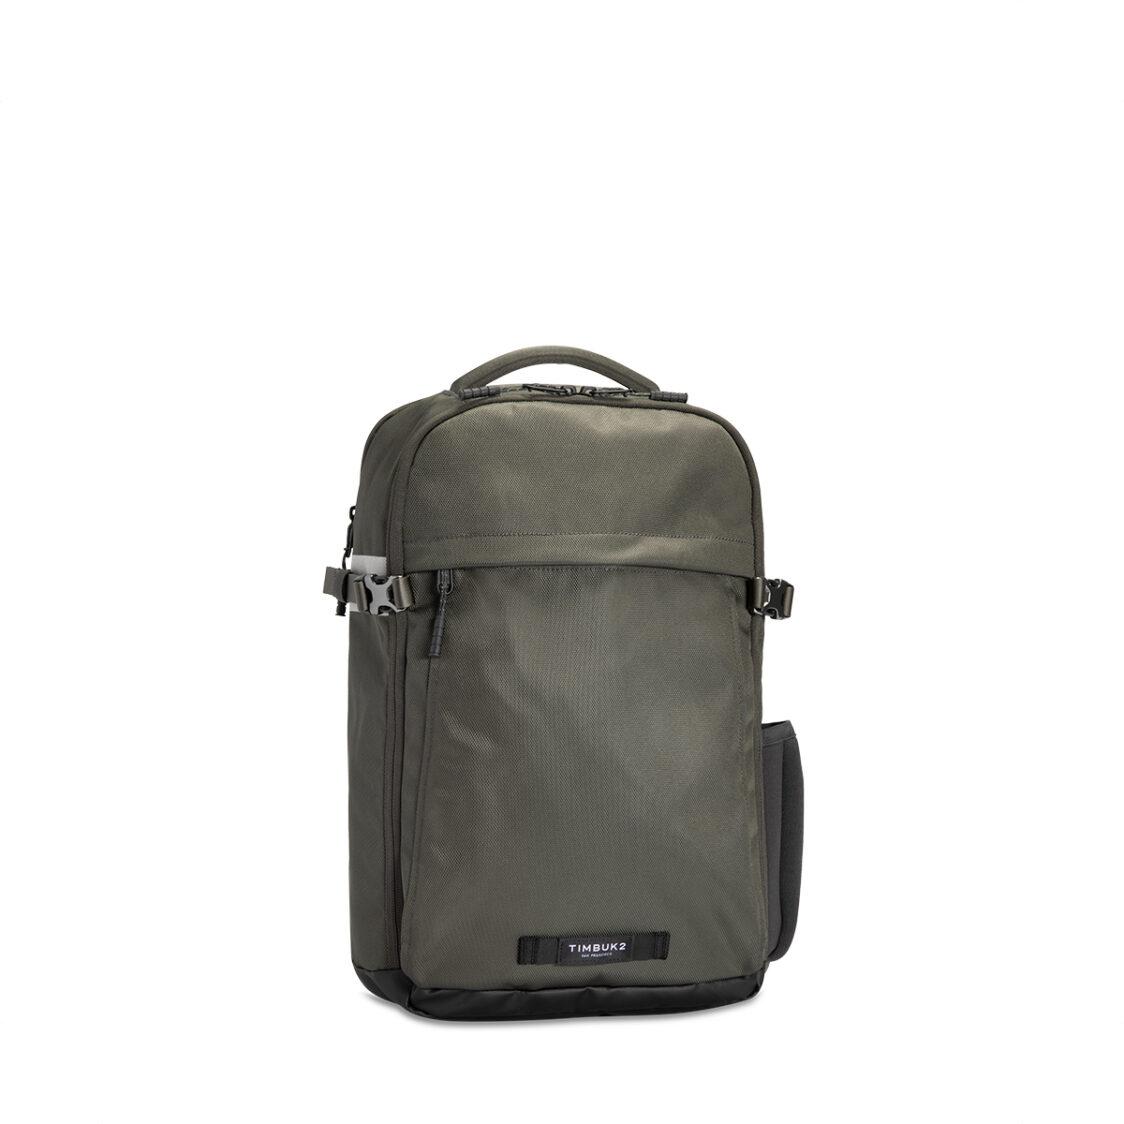 Timbuk2 Division Laptop Backpack Deluxe - Titanium